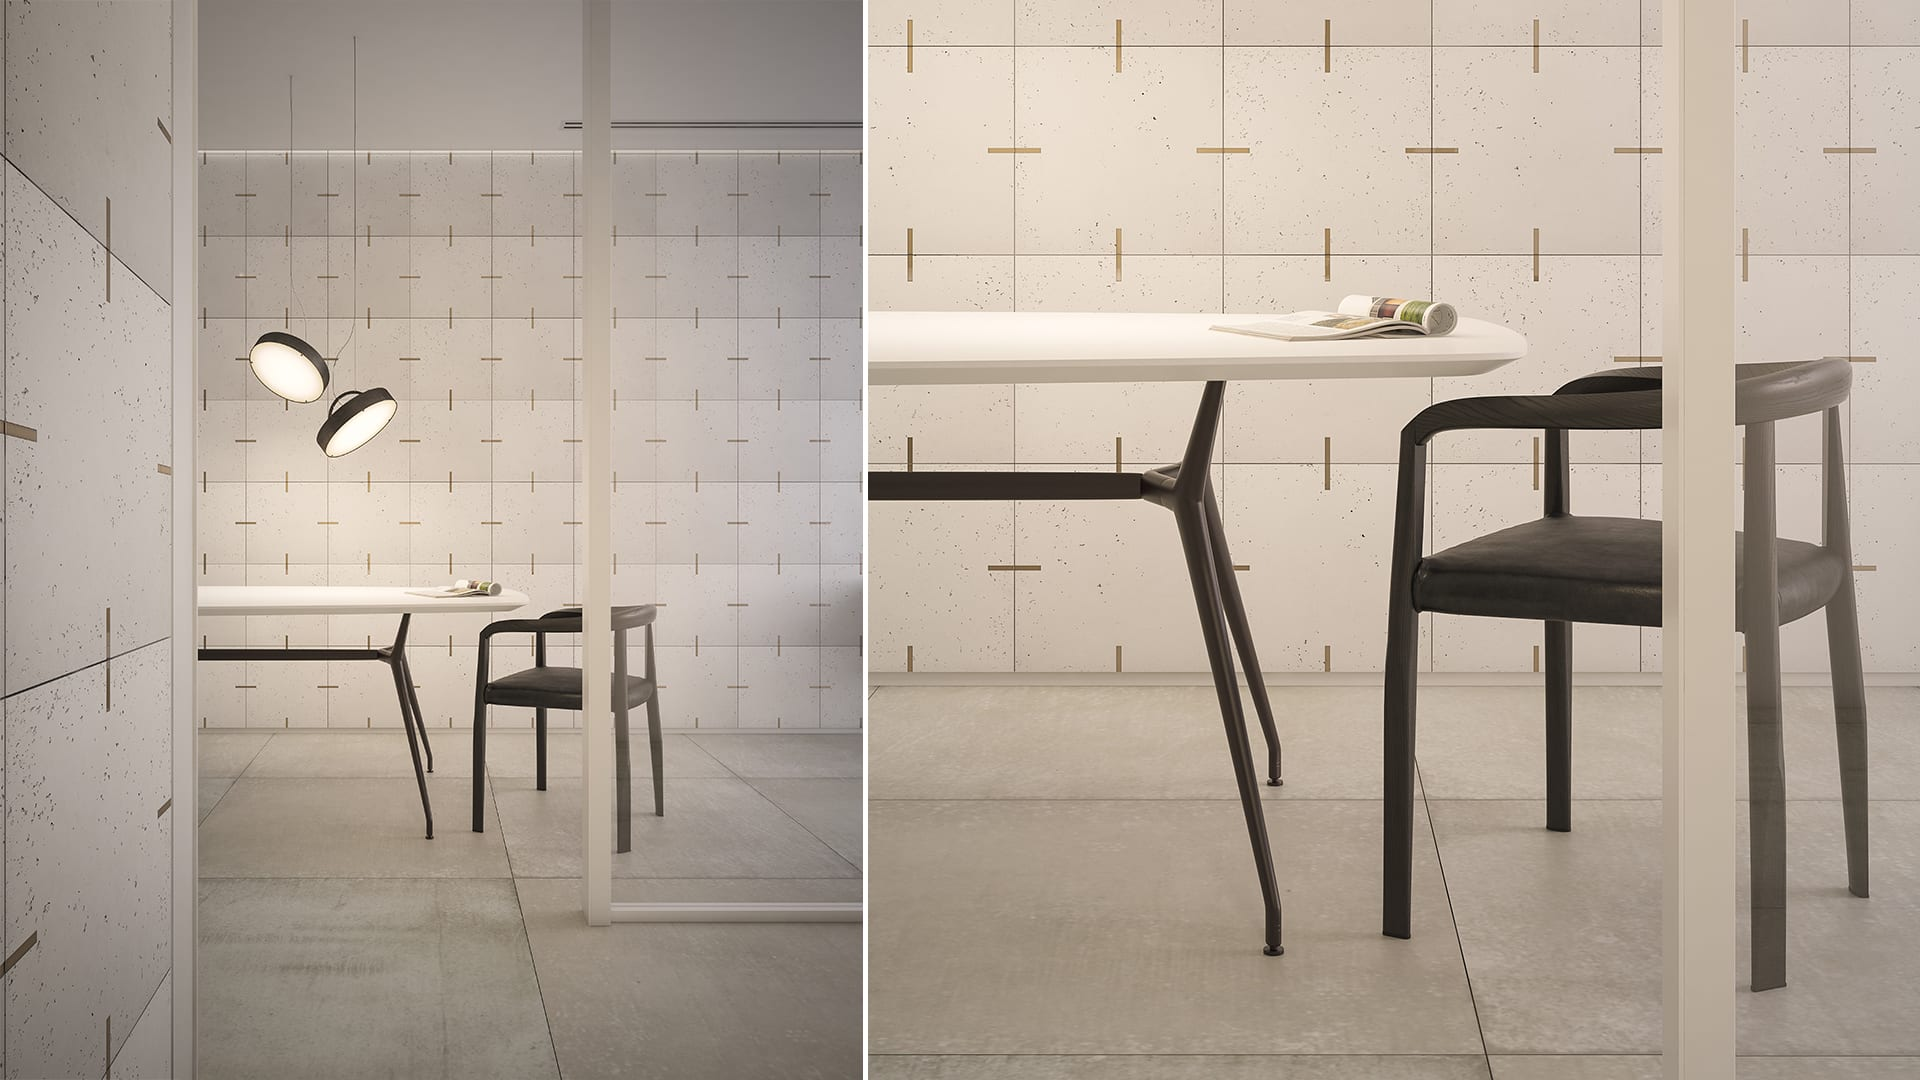 Maayan-Golan_Architectural-Visualization_product-visualization_wall-tiles_lighting-fixture_itai-bar-on_office_06